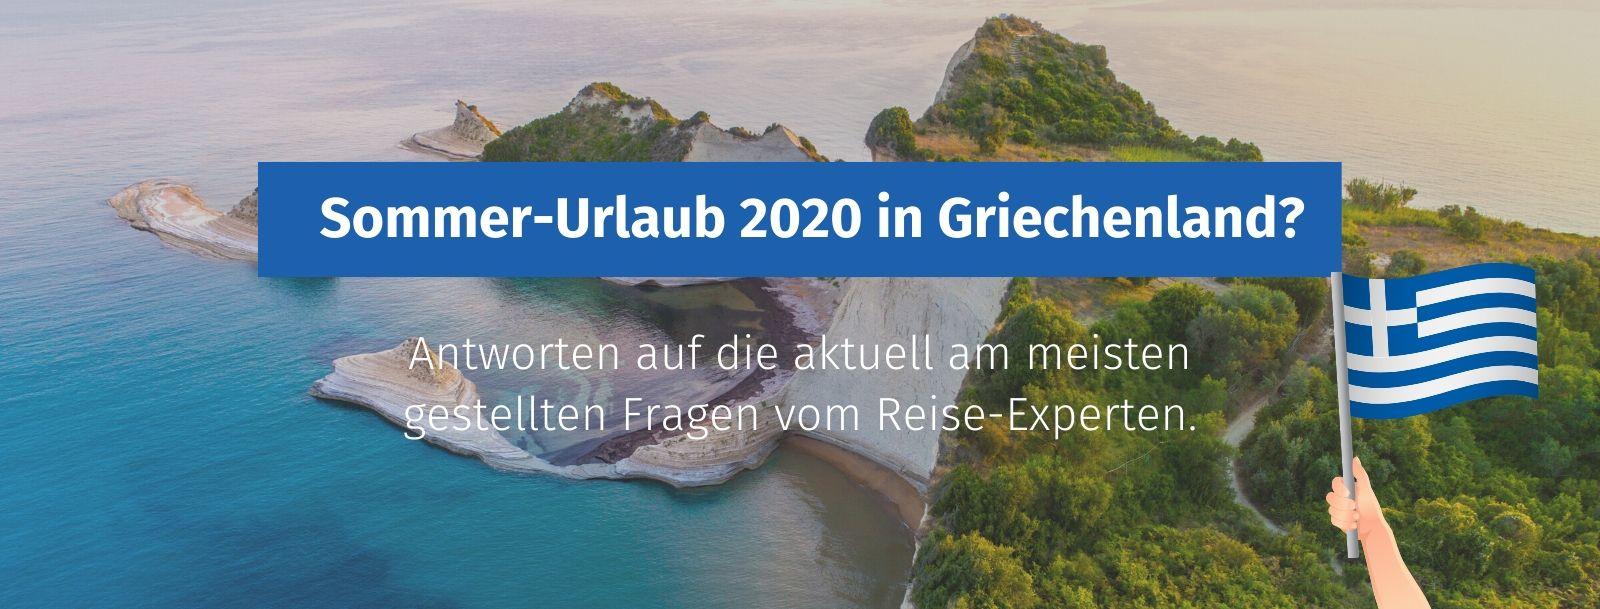 urlaub in griechenland 2020 Sommer Corona Reisebuero